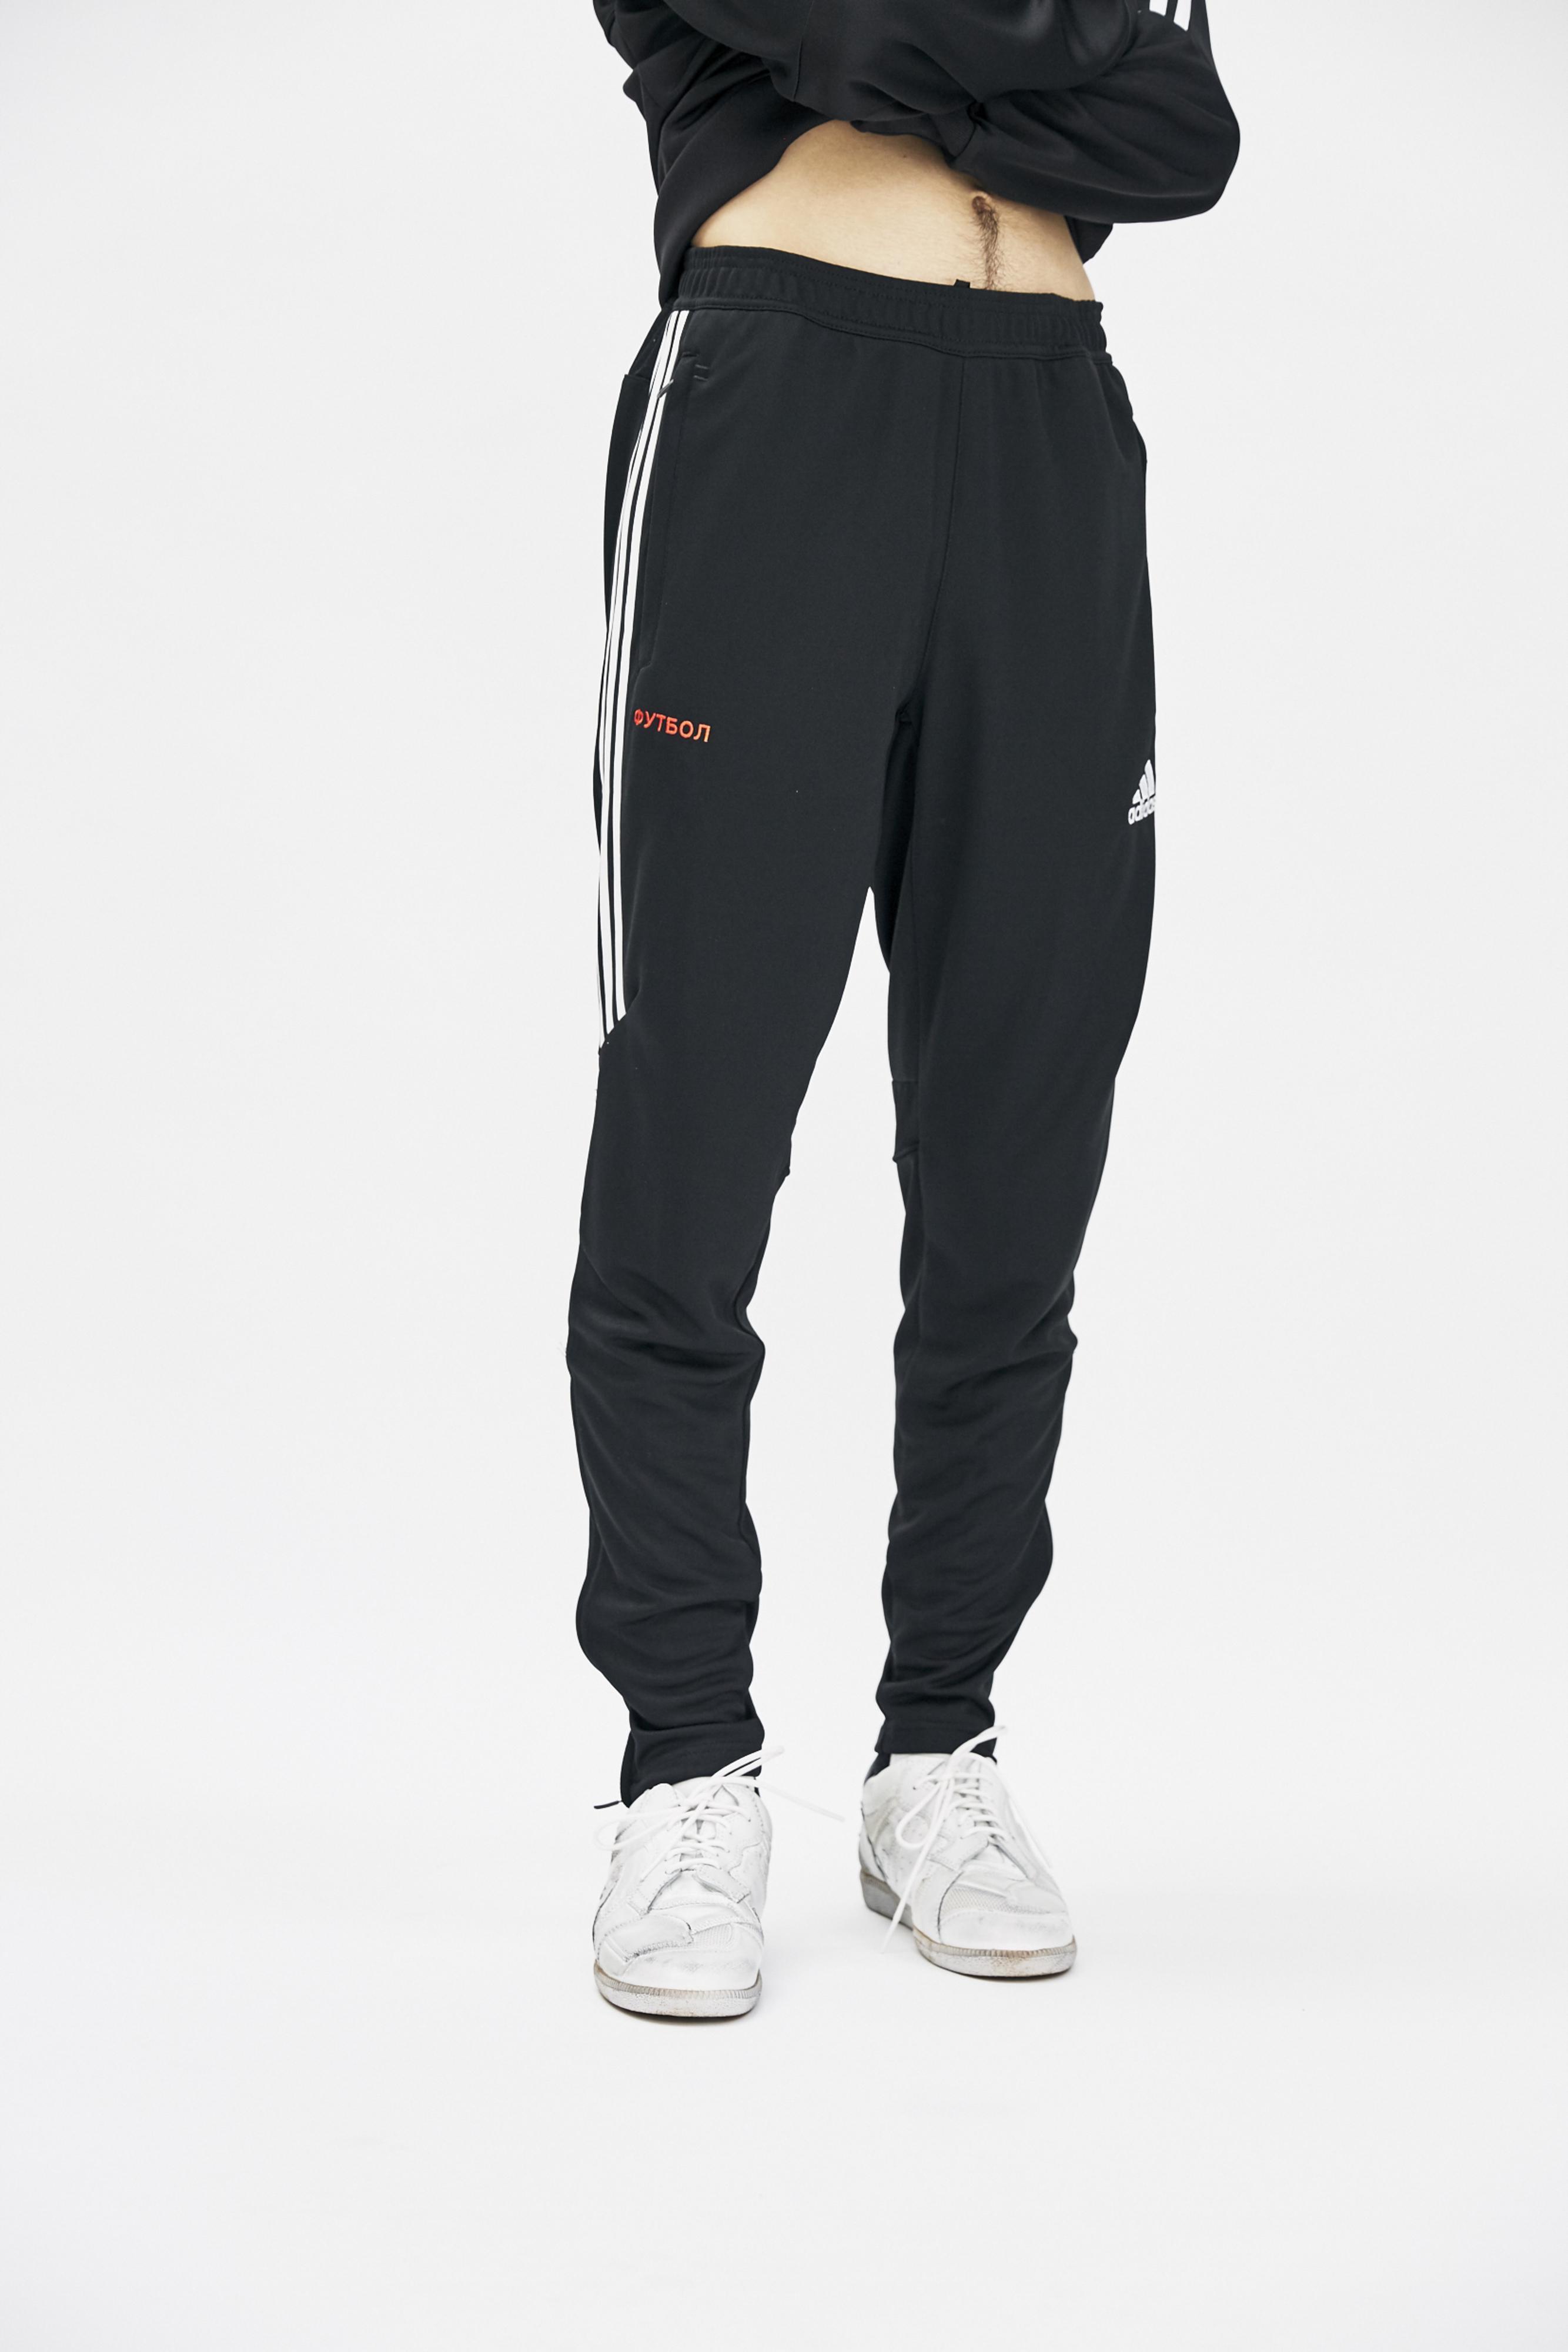 san francisco 3829a e9091 Gosha Rubchinskiy Black Adidas Sweatpants for men